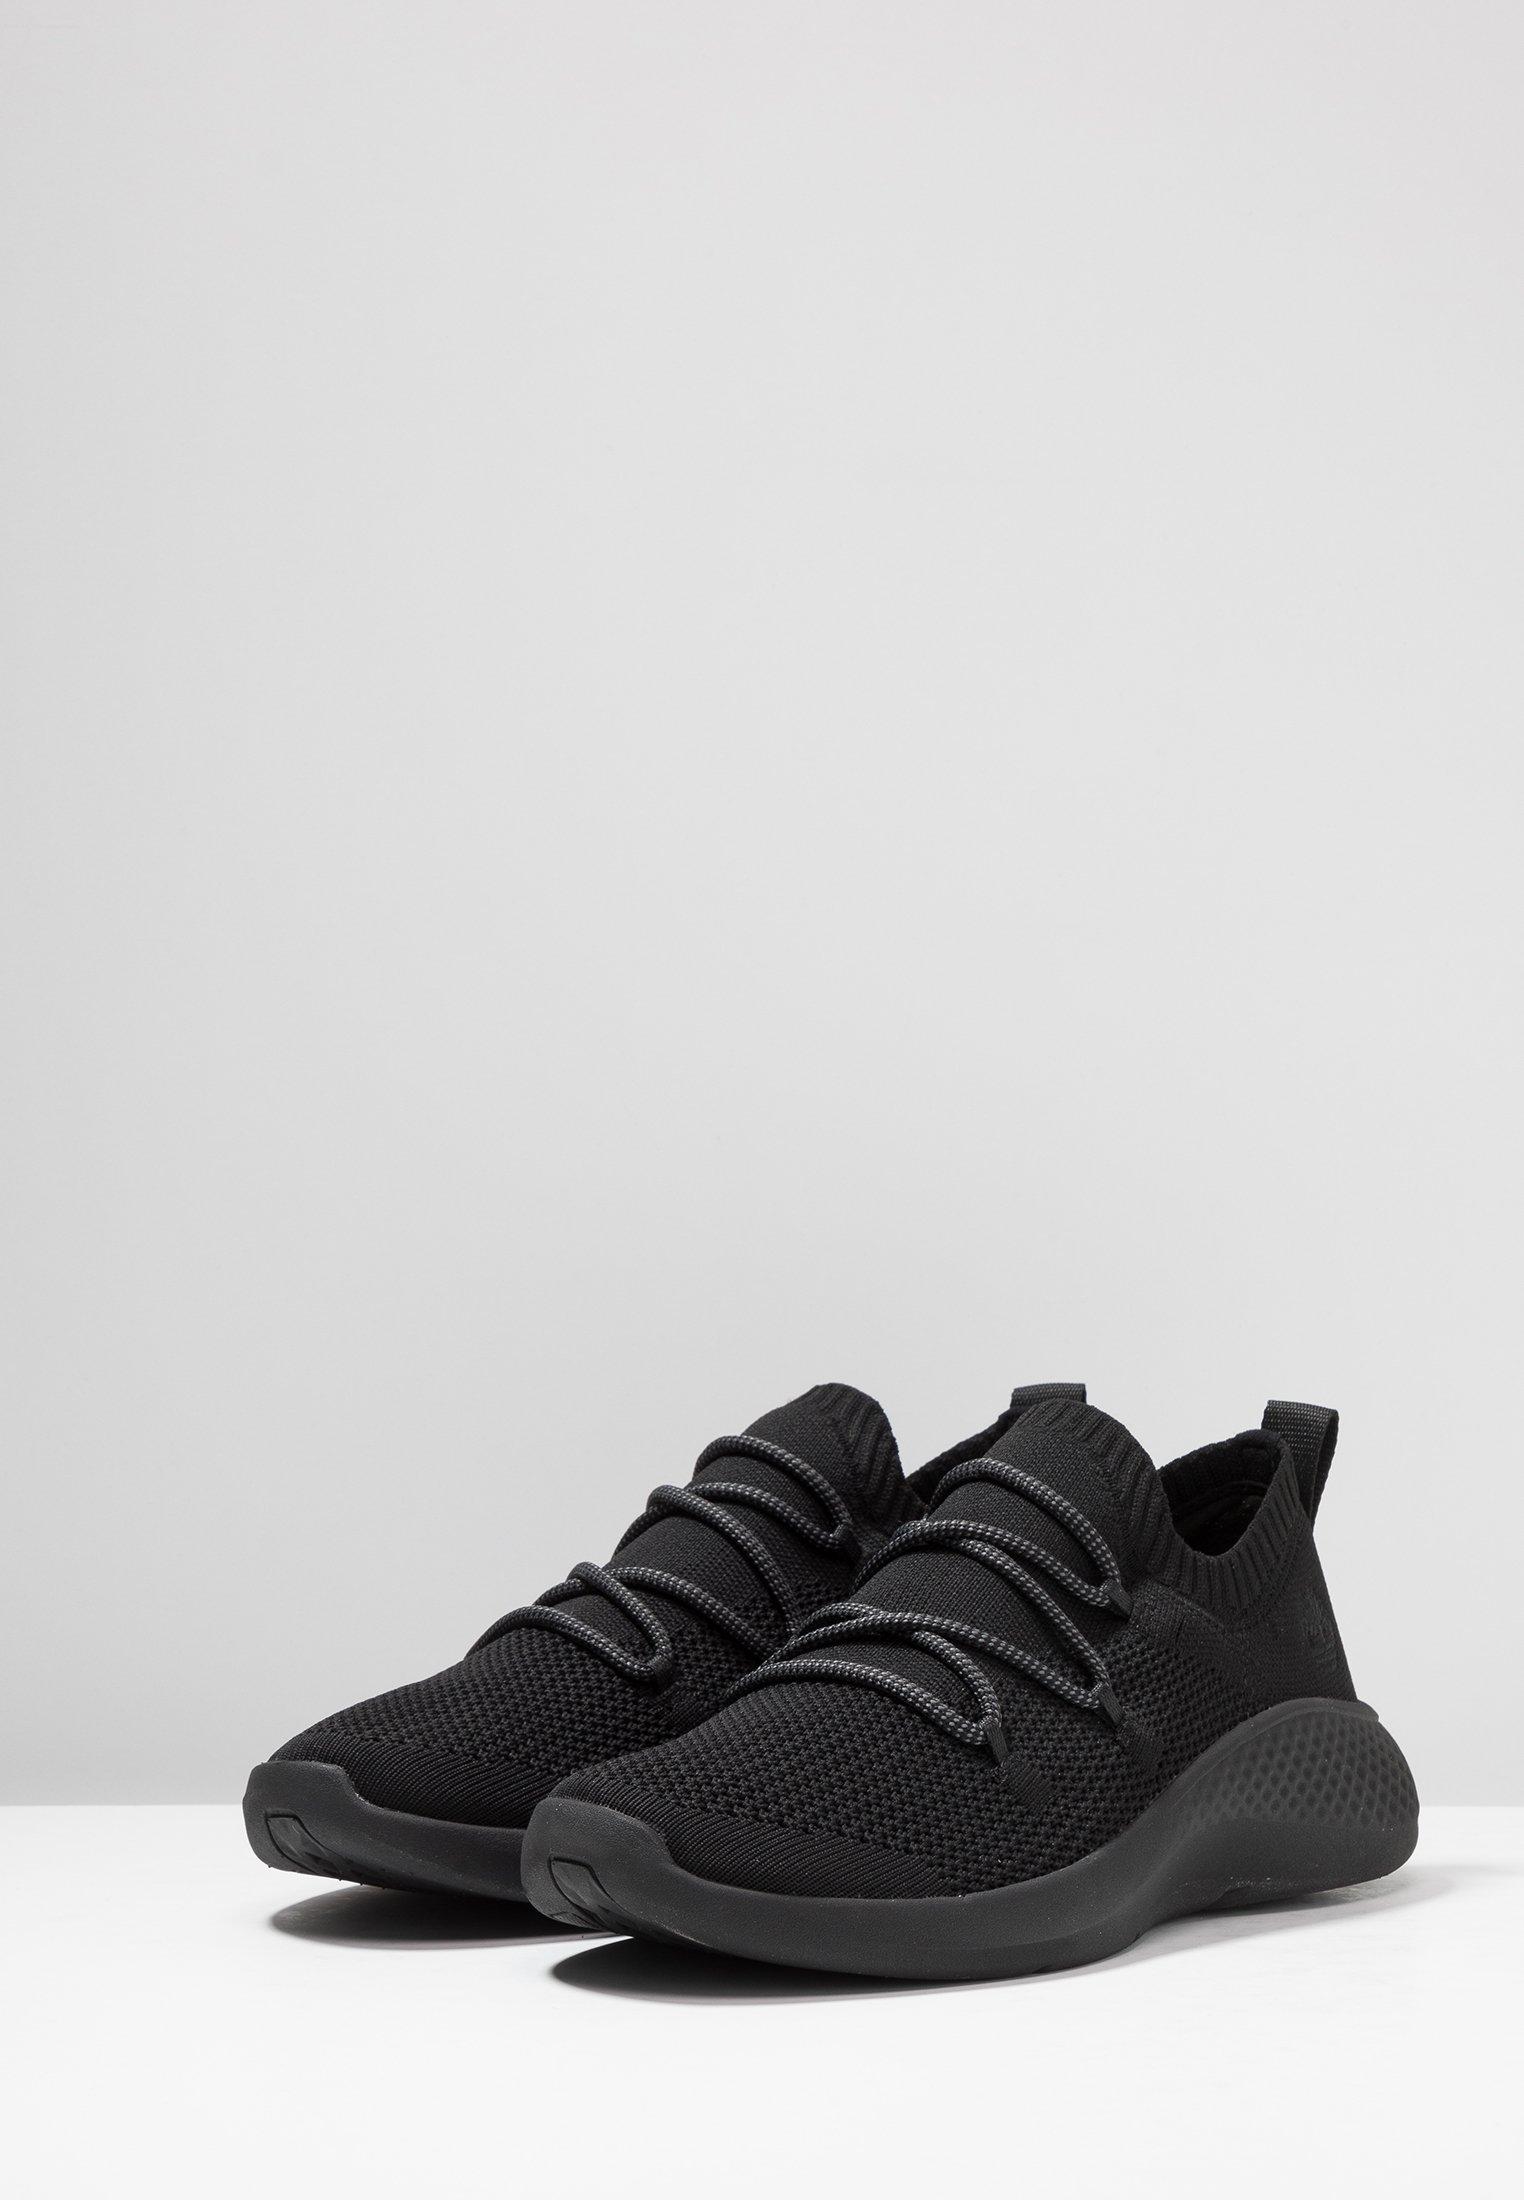 Timberland Flyroam Go Stohl Oxford - Sneaker Low Blackout Black Friday